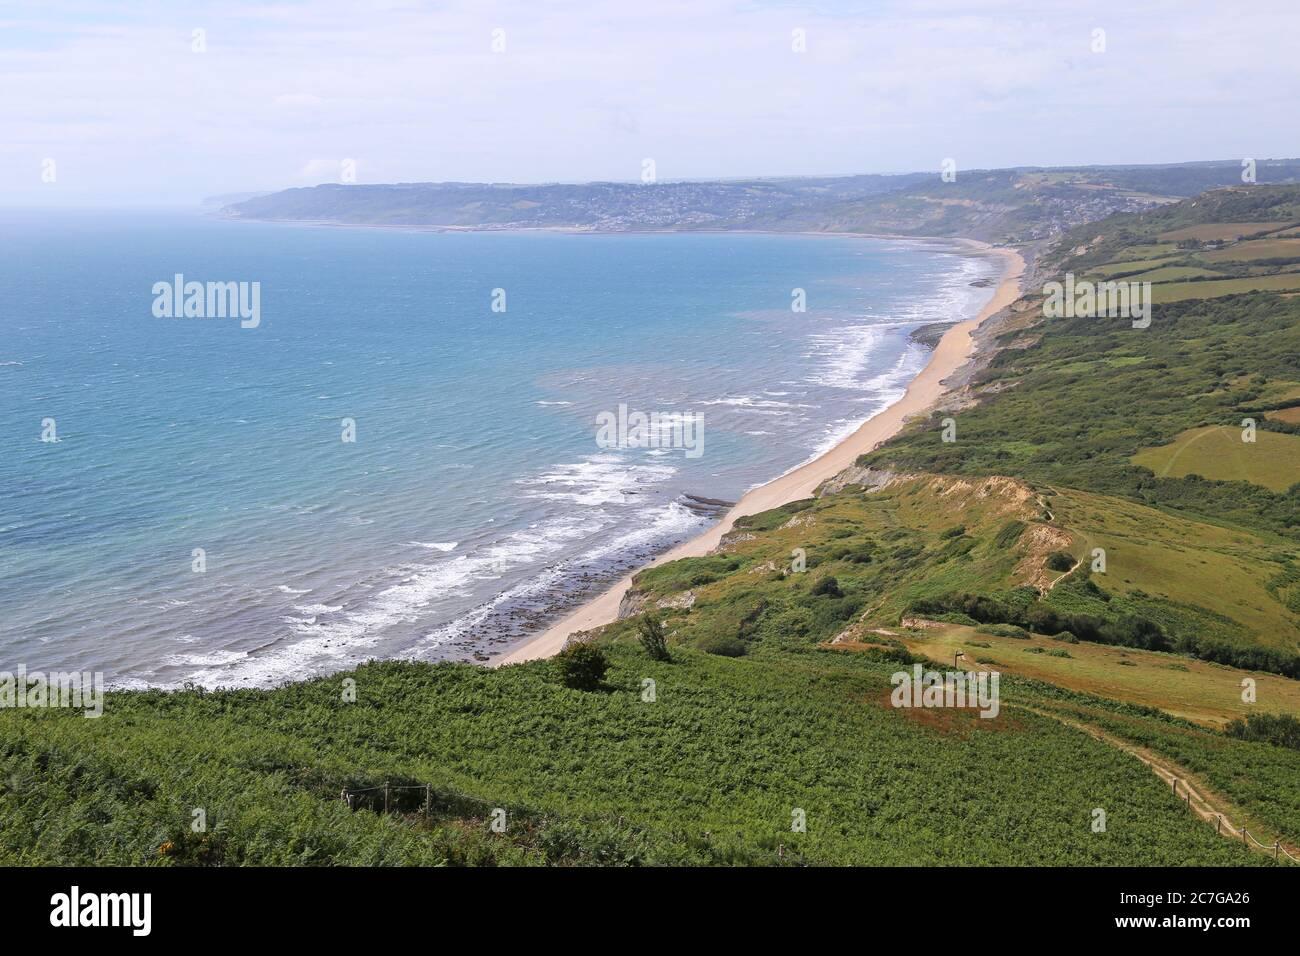 Vista hacia el oeste desde Golden Cap, South West Coast Path, Dorset, Inglaterra, Gran Bretaña, Reino Unido, Reino Unido, Europa Foto de stock